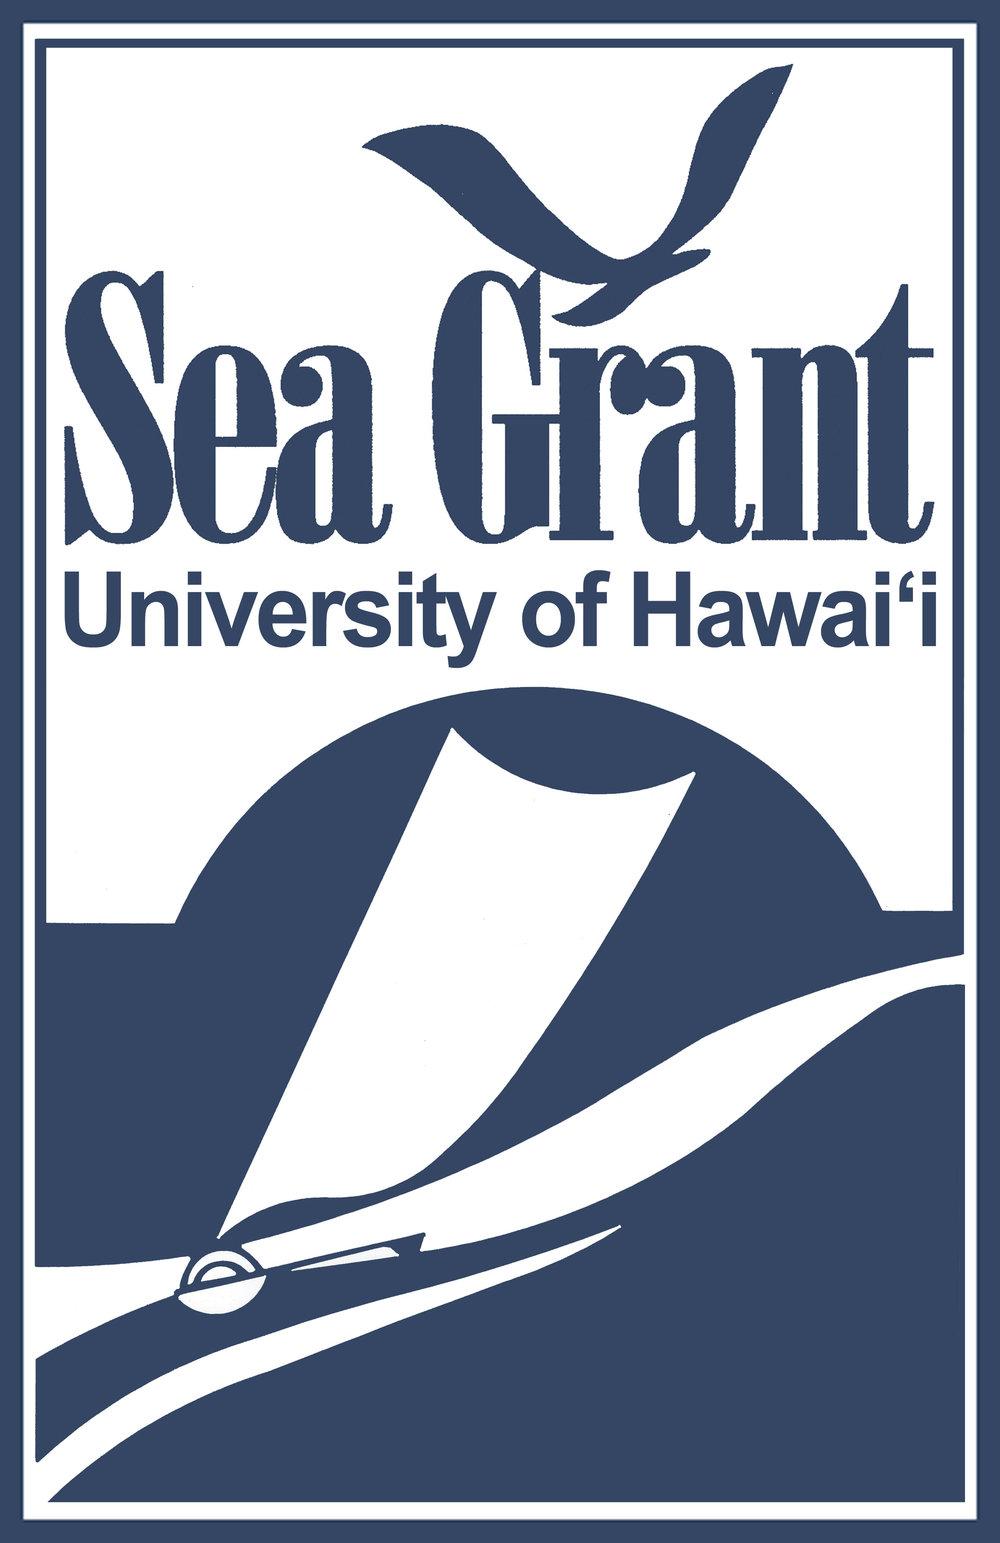 Sea_Grant_Logo.jpg